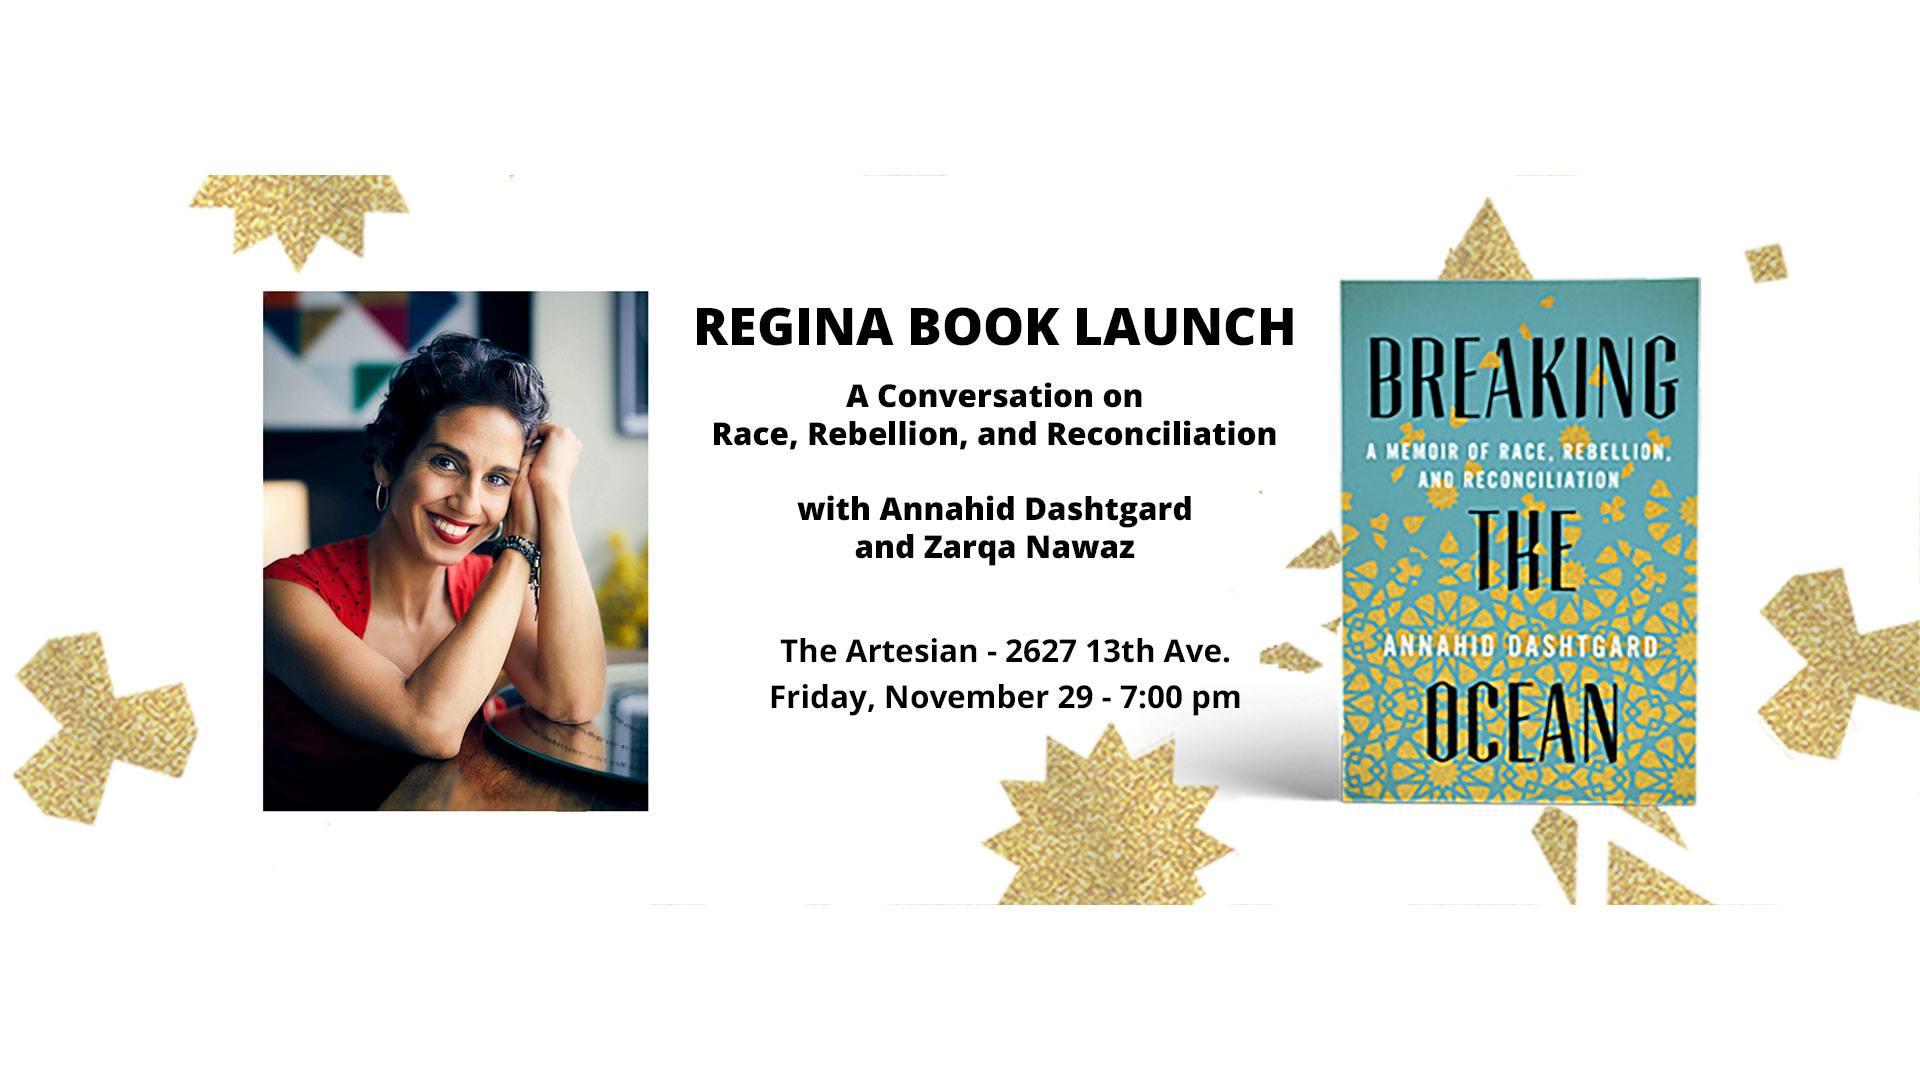 Breaking the Ocean Launch with Annahid Dashtgard and Zarqa Nawaz